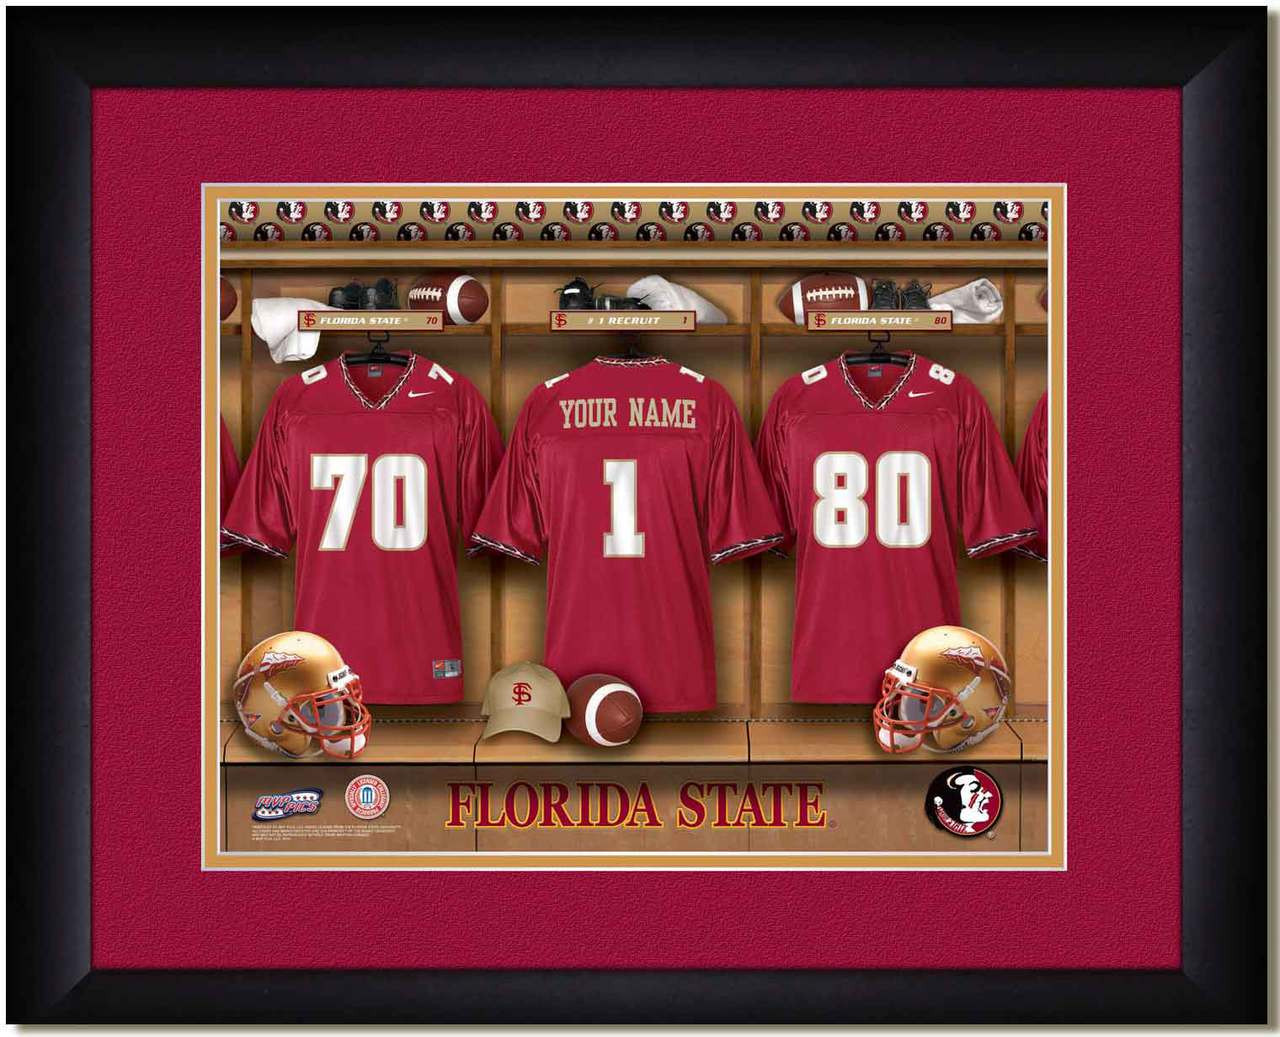 ce47075ecbf Florida State Seminoles Personalized Locker Room Poster